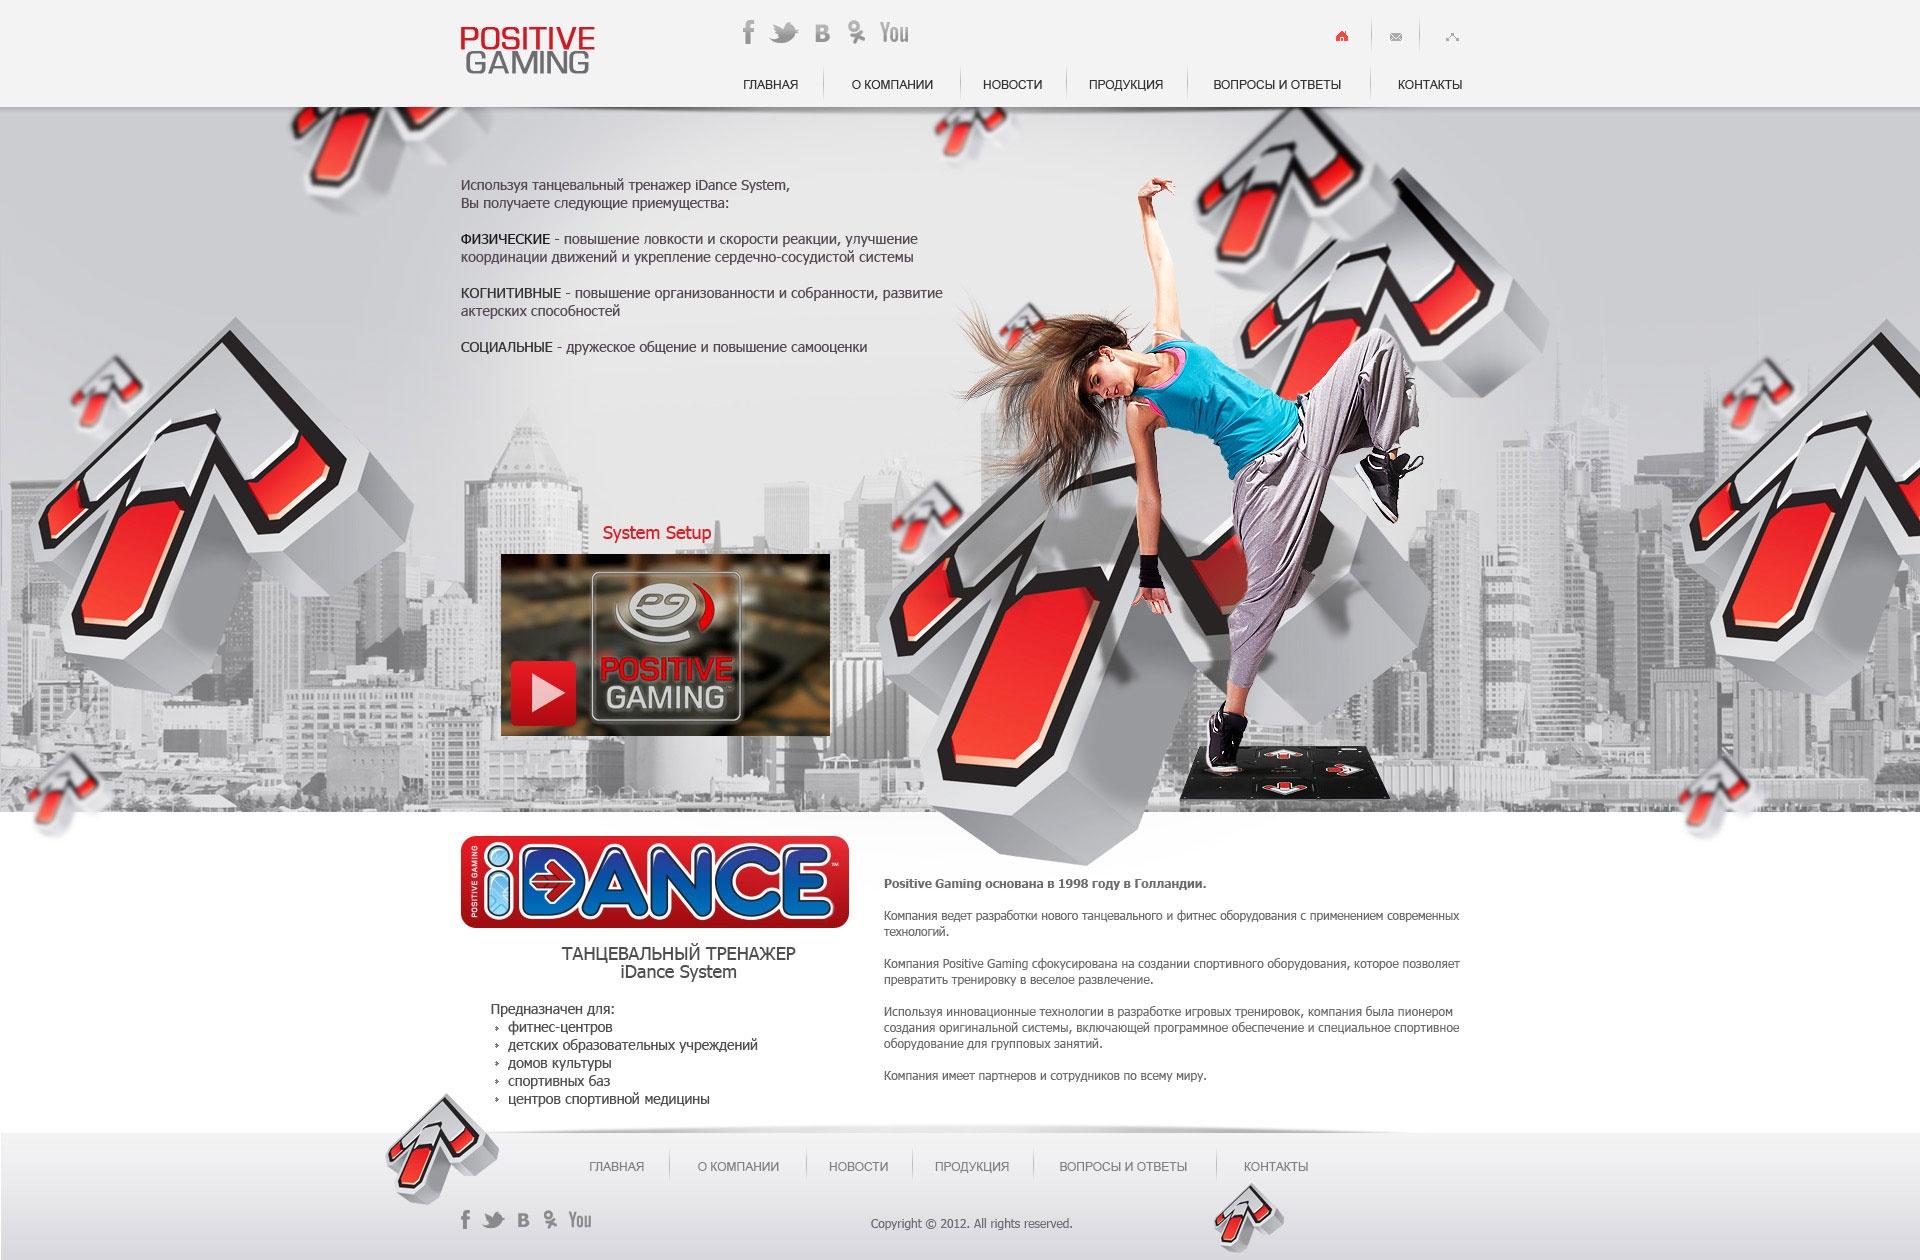 iDance-System